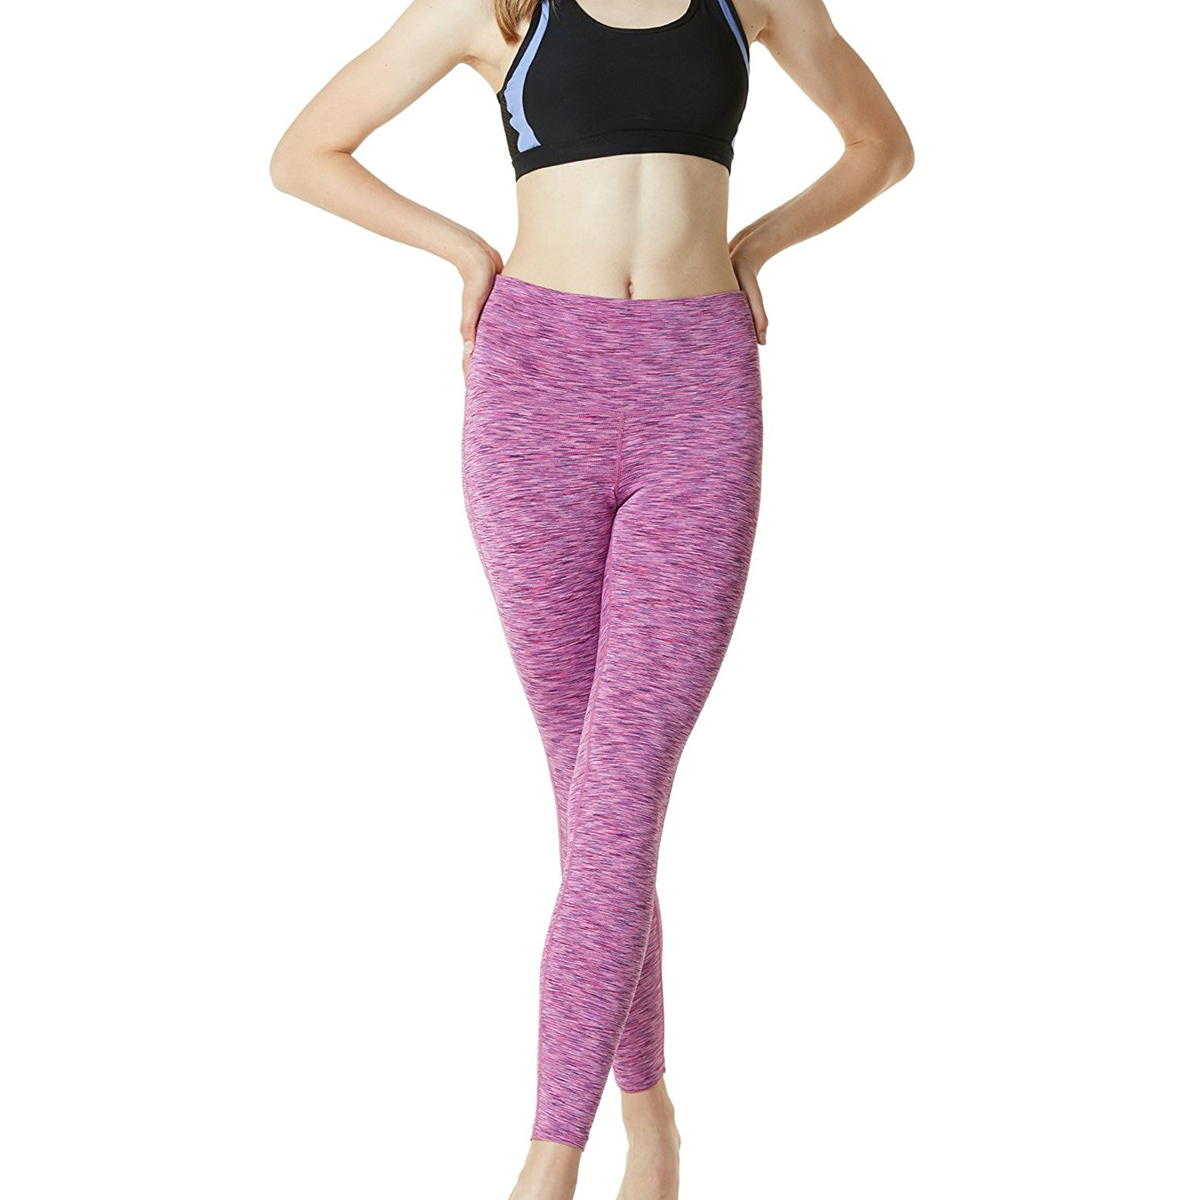 thumbnail 93 - TSLA Tesla FYP42 Women's High-Waisted Ultra-Stretch Tummy Control Yoga Pants